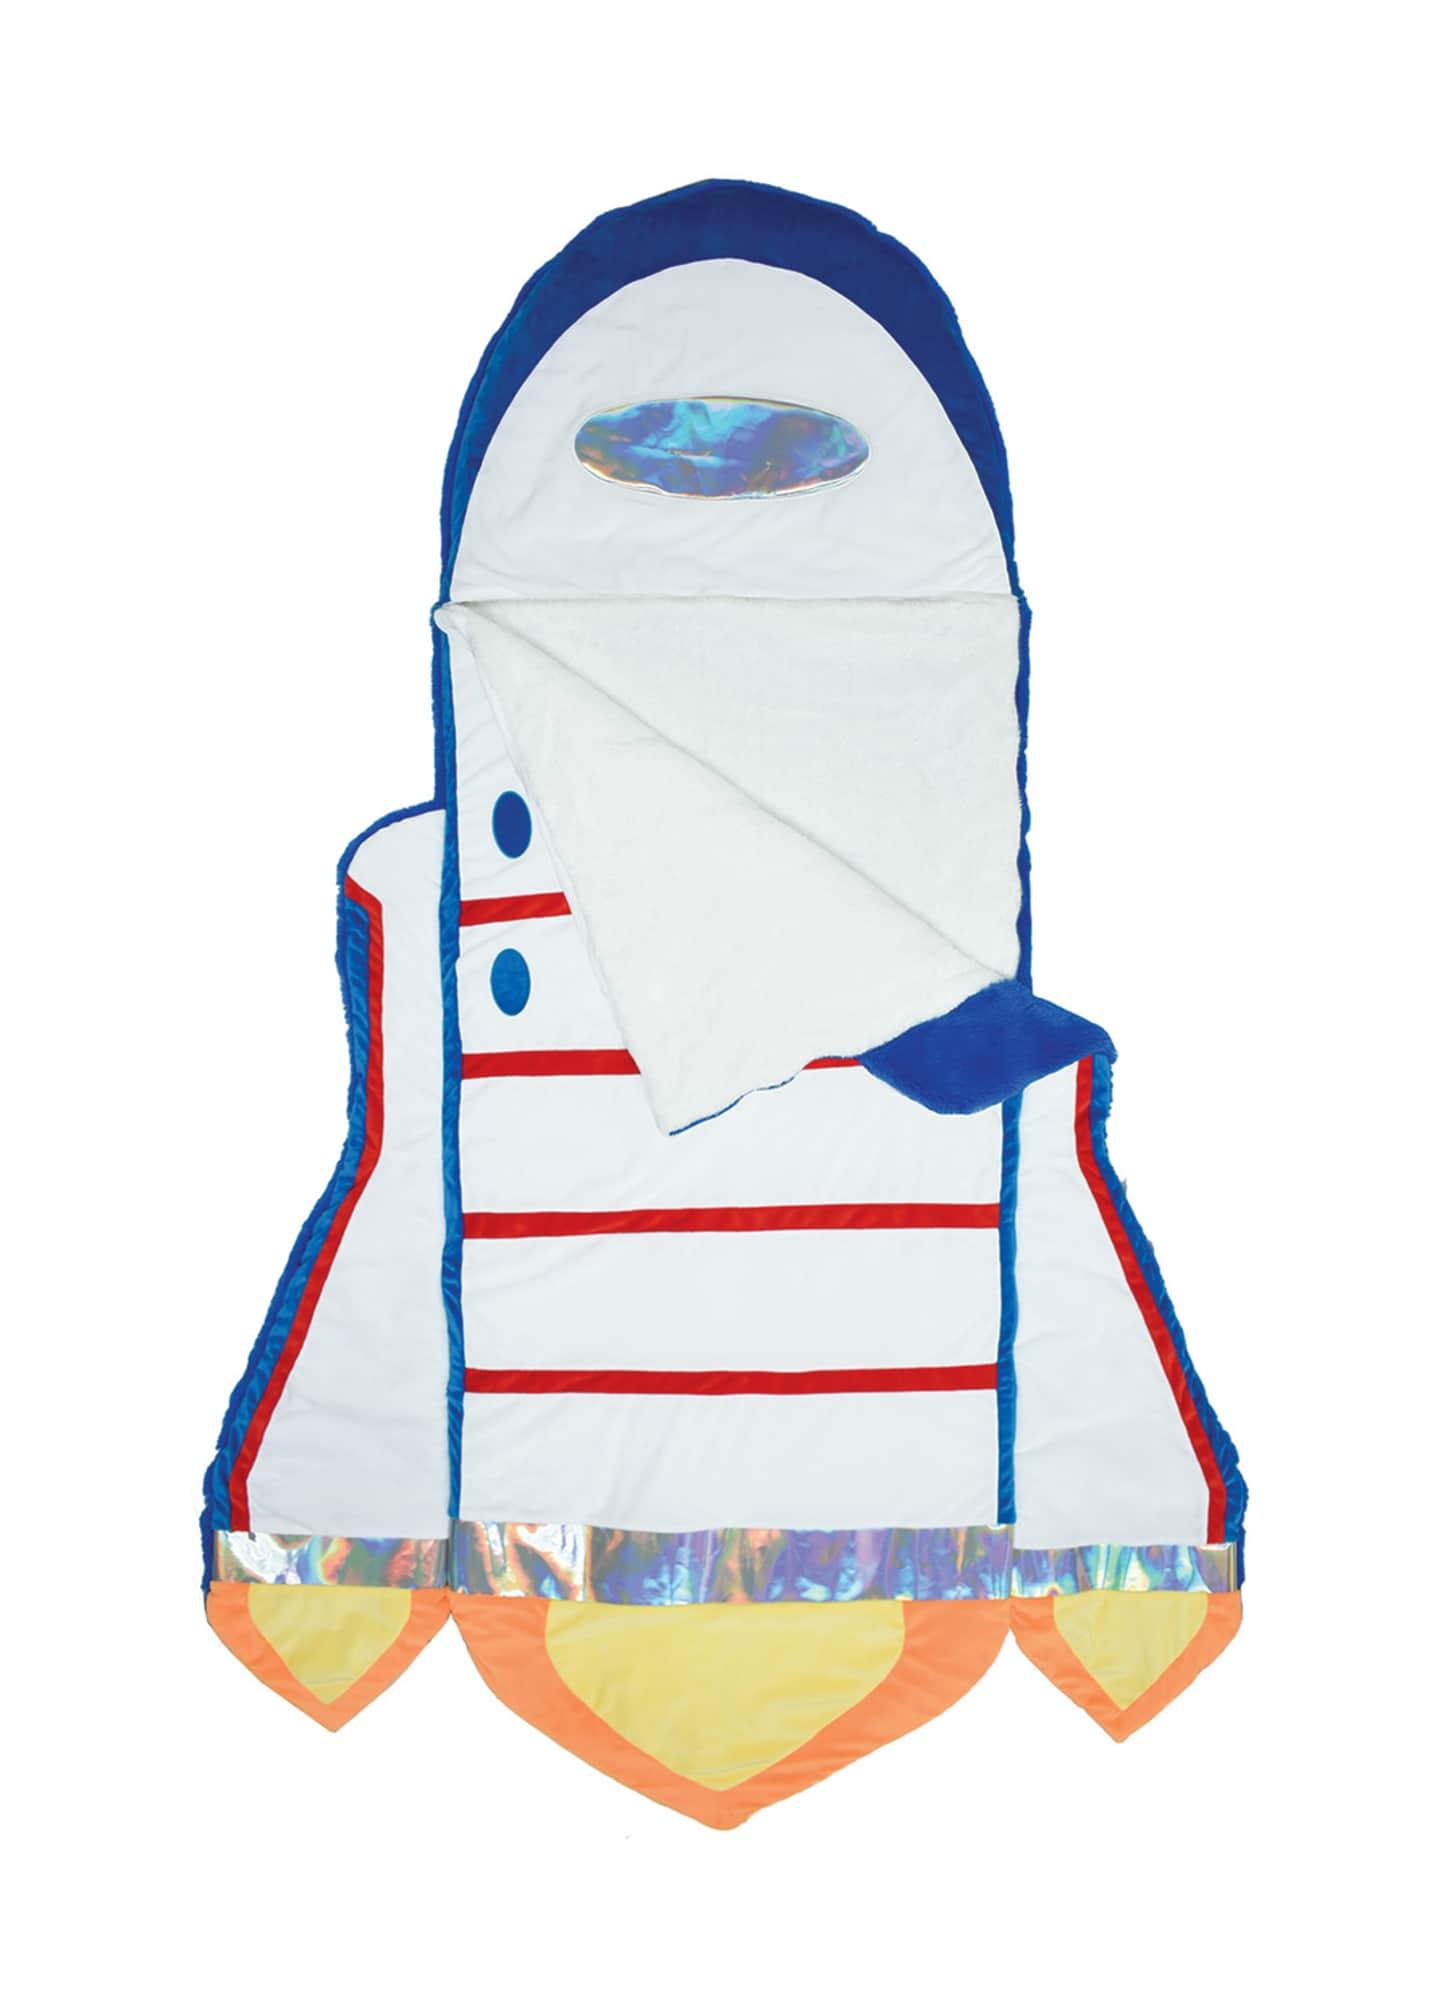 Iscream Space Shuttle Sleeping Bag